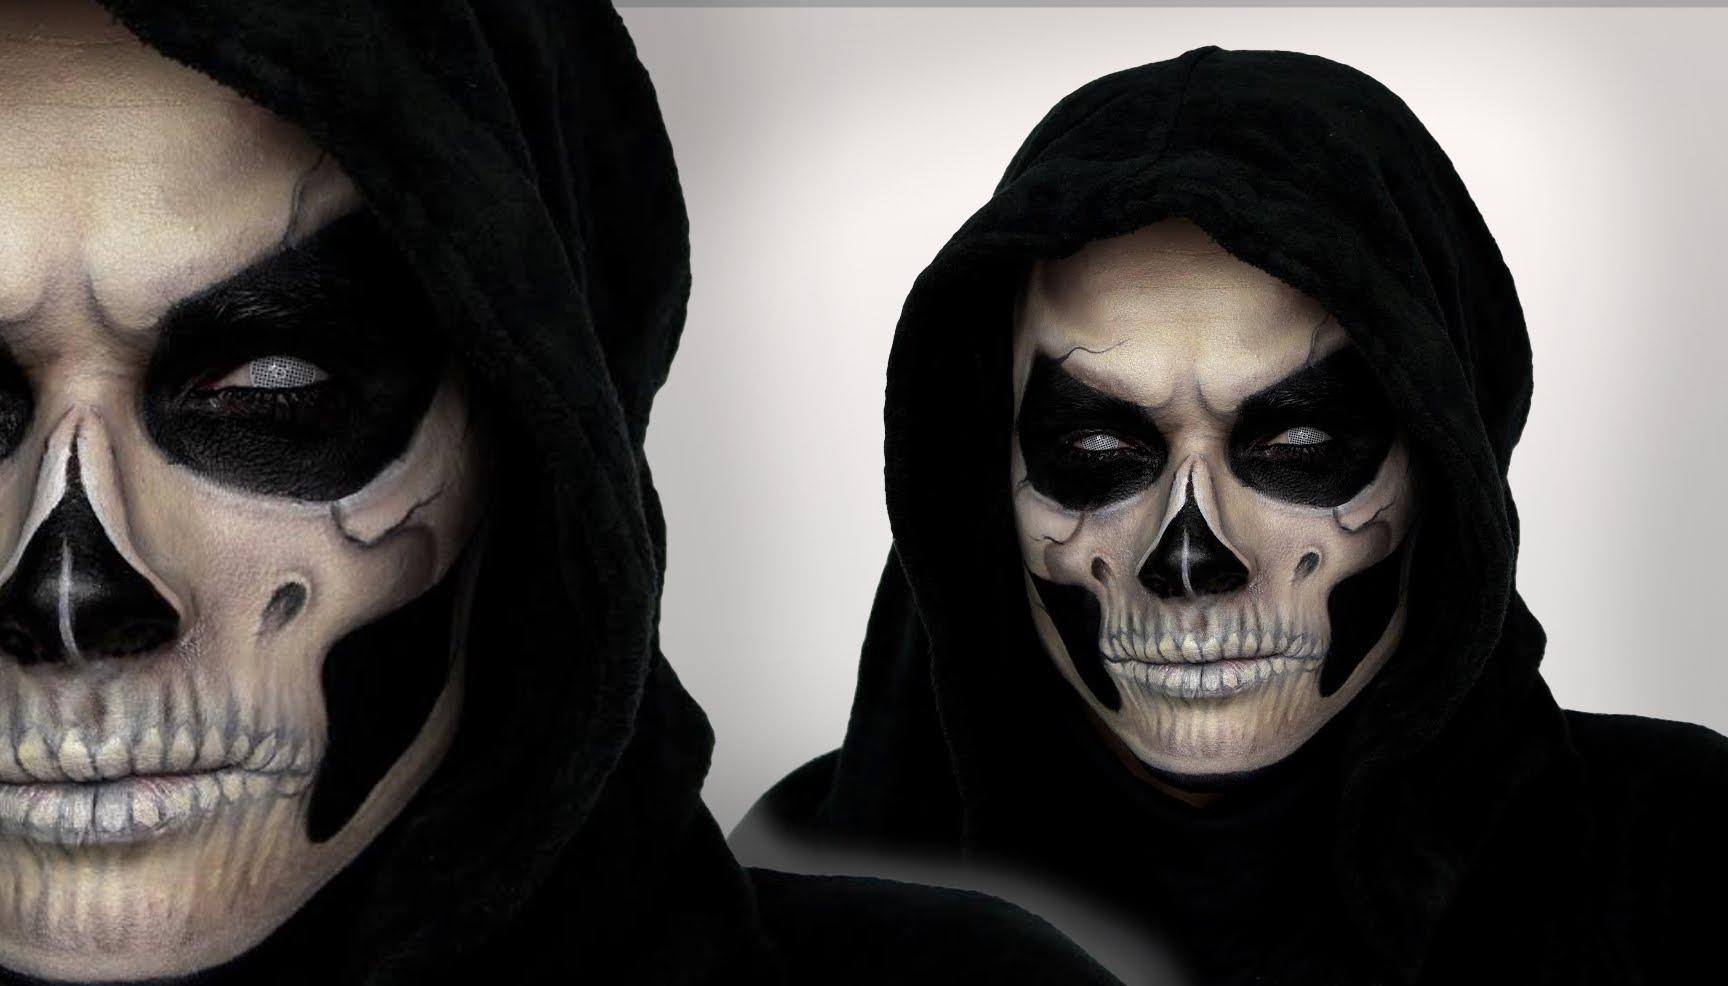 Trucco Halloween Vampiro Uomo.Trucco Halloween Uomo Videotrucco